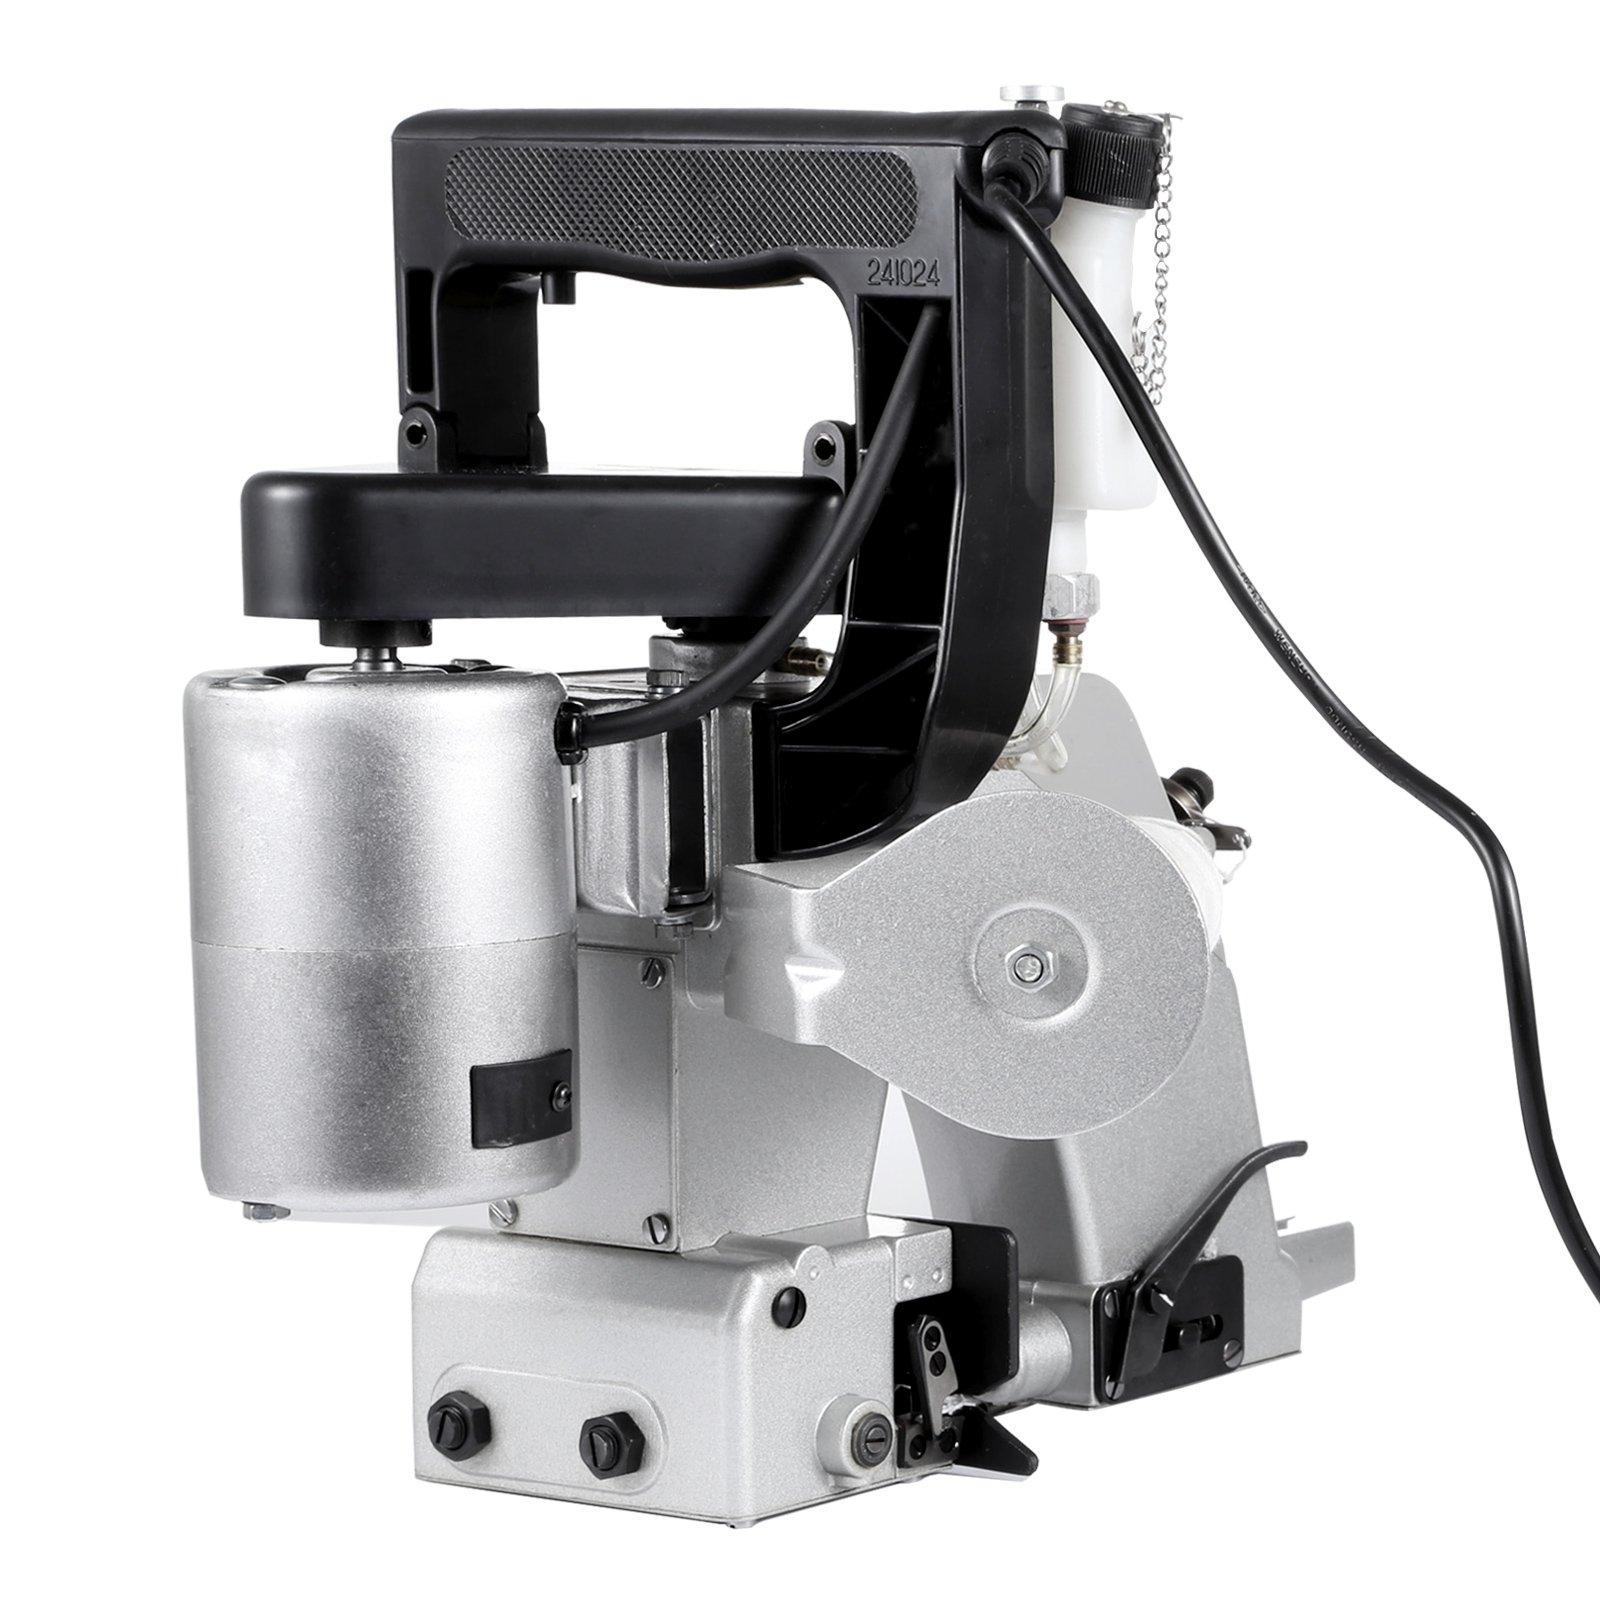 VEVOR Portable Bag Closer GK26-1A Bag Closer Sewing Machine 90W Electric Sewing Machine for Woven Snakeskin Bag Sack GK26-1A